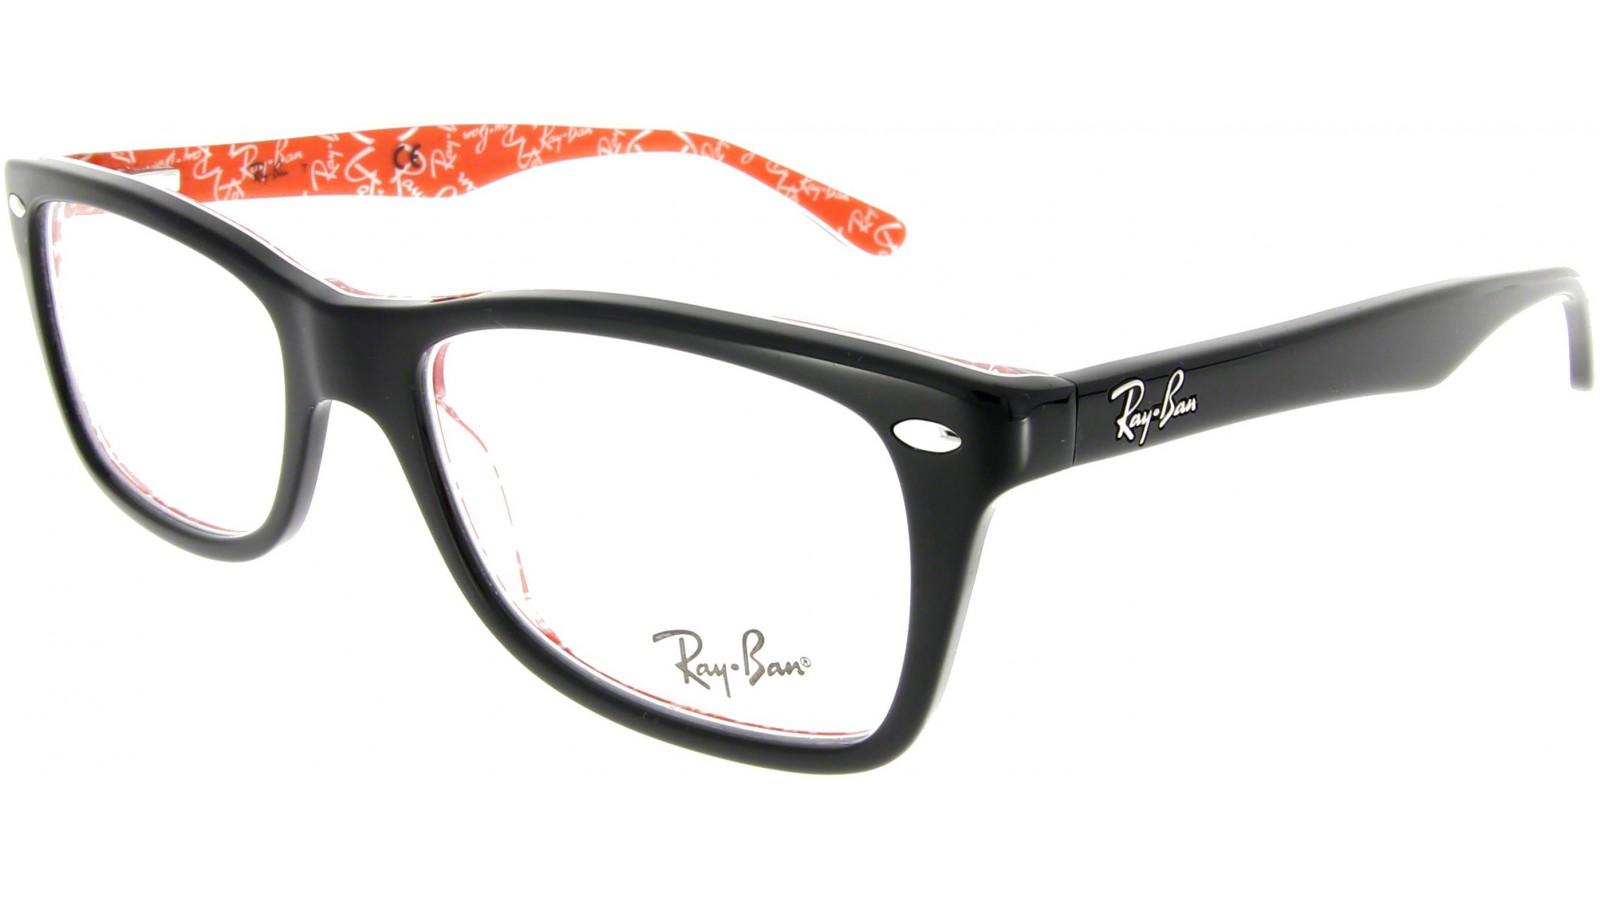 ray ban brillen damen nerd fliesen. Black Bedroom Furniture Sets. Home Design Ideas